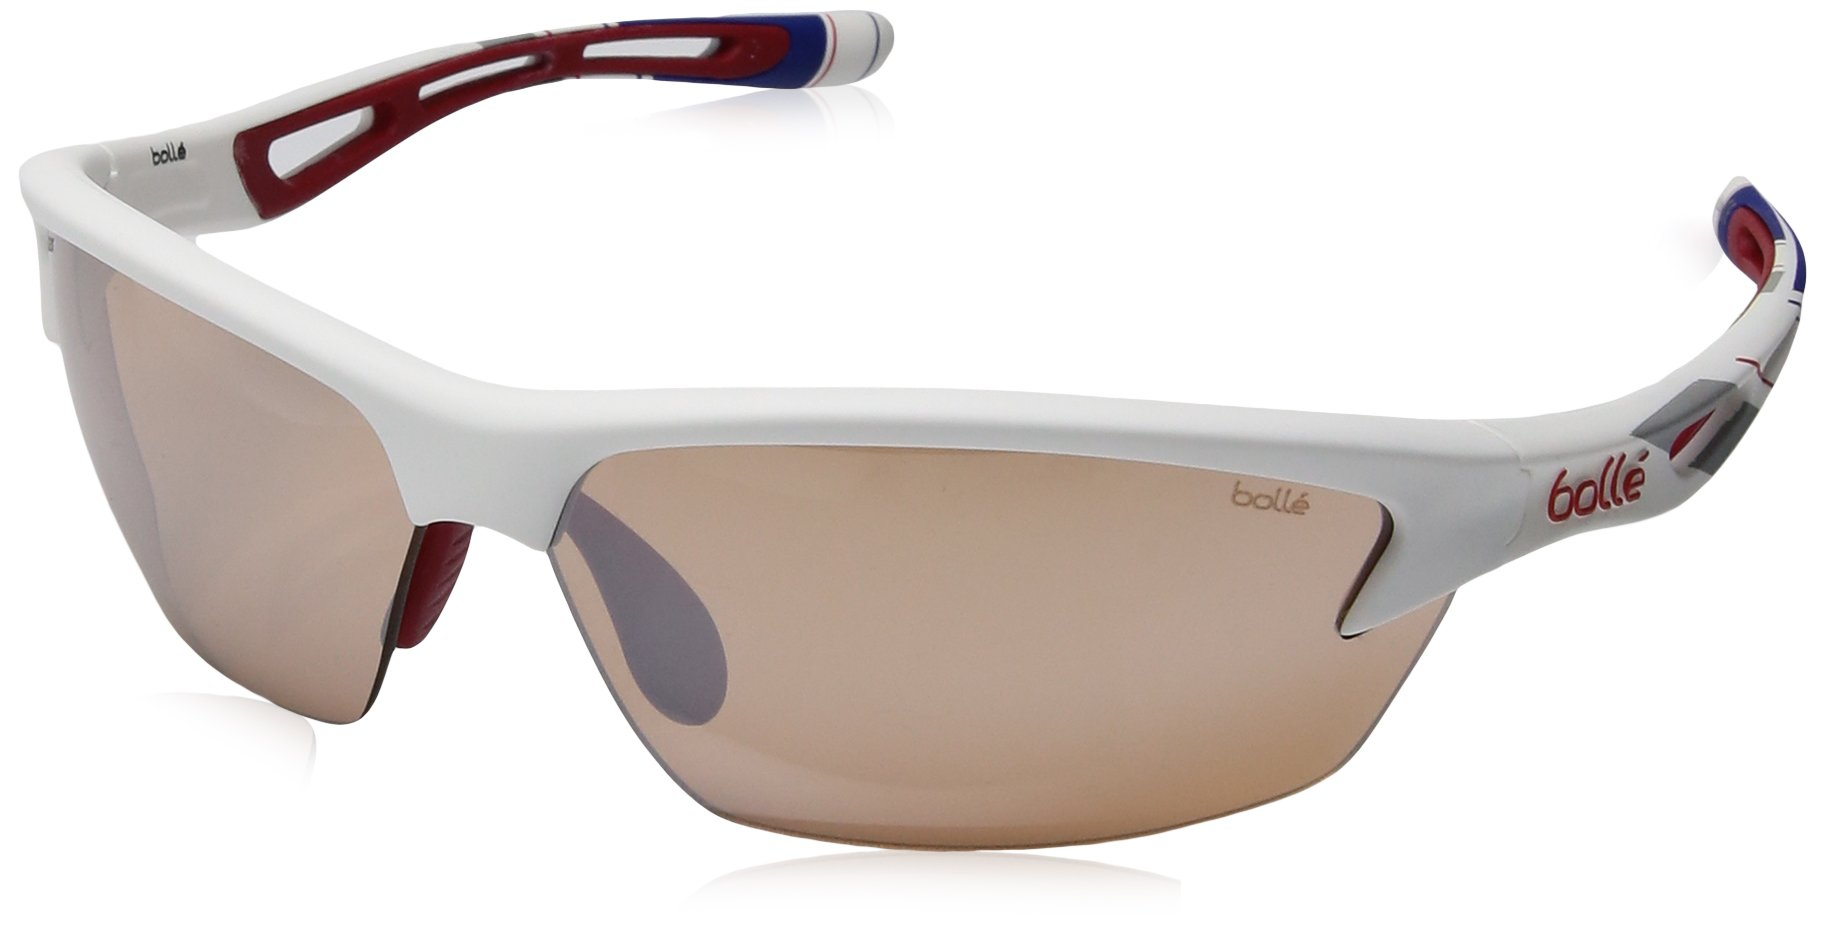 Bolle Bolt Sunglasses, Red/White/Blue Modulator V3 Golf Oleo AF by Bolle